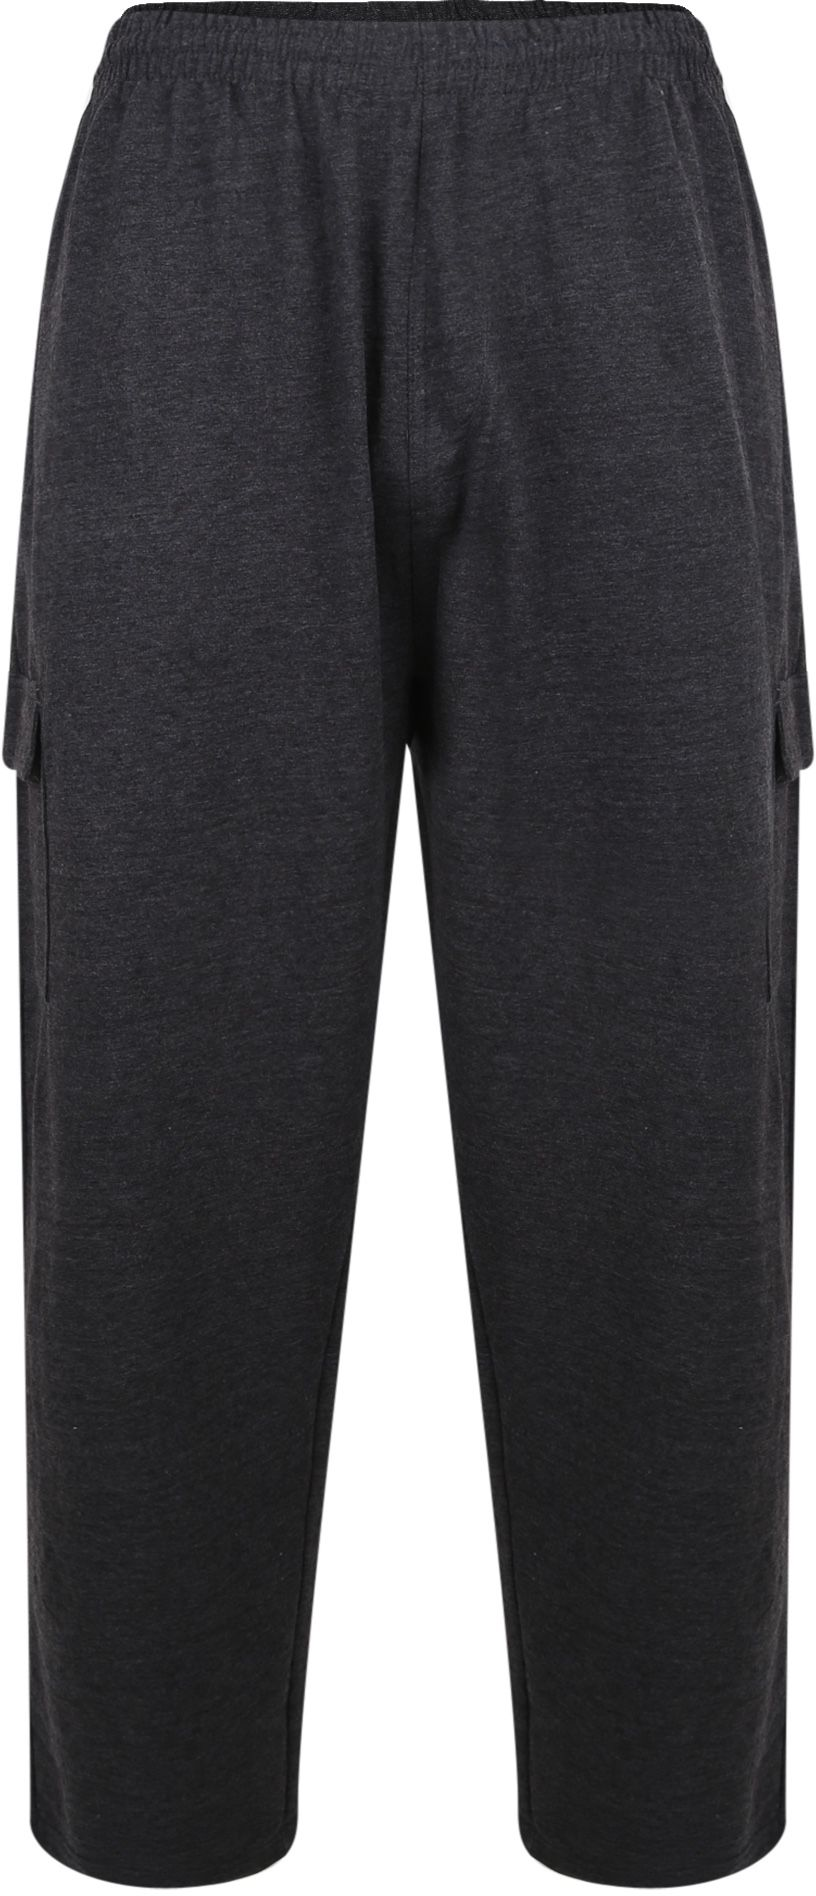 Pantalon de Jogging Gris Grande Taille KAM JEANSWEAR Taille Haute